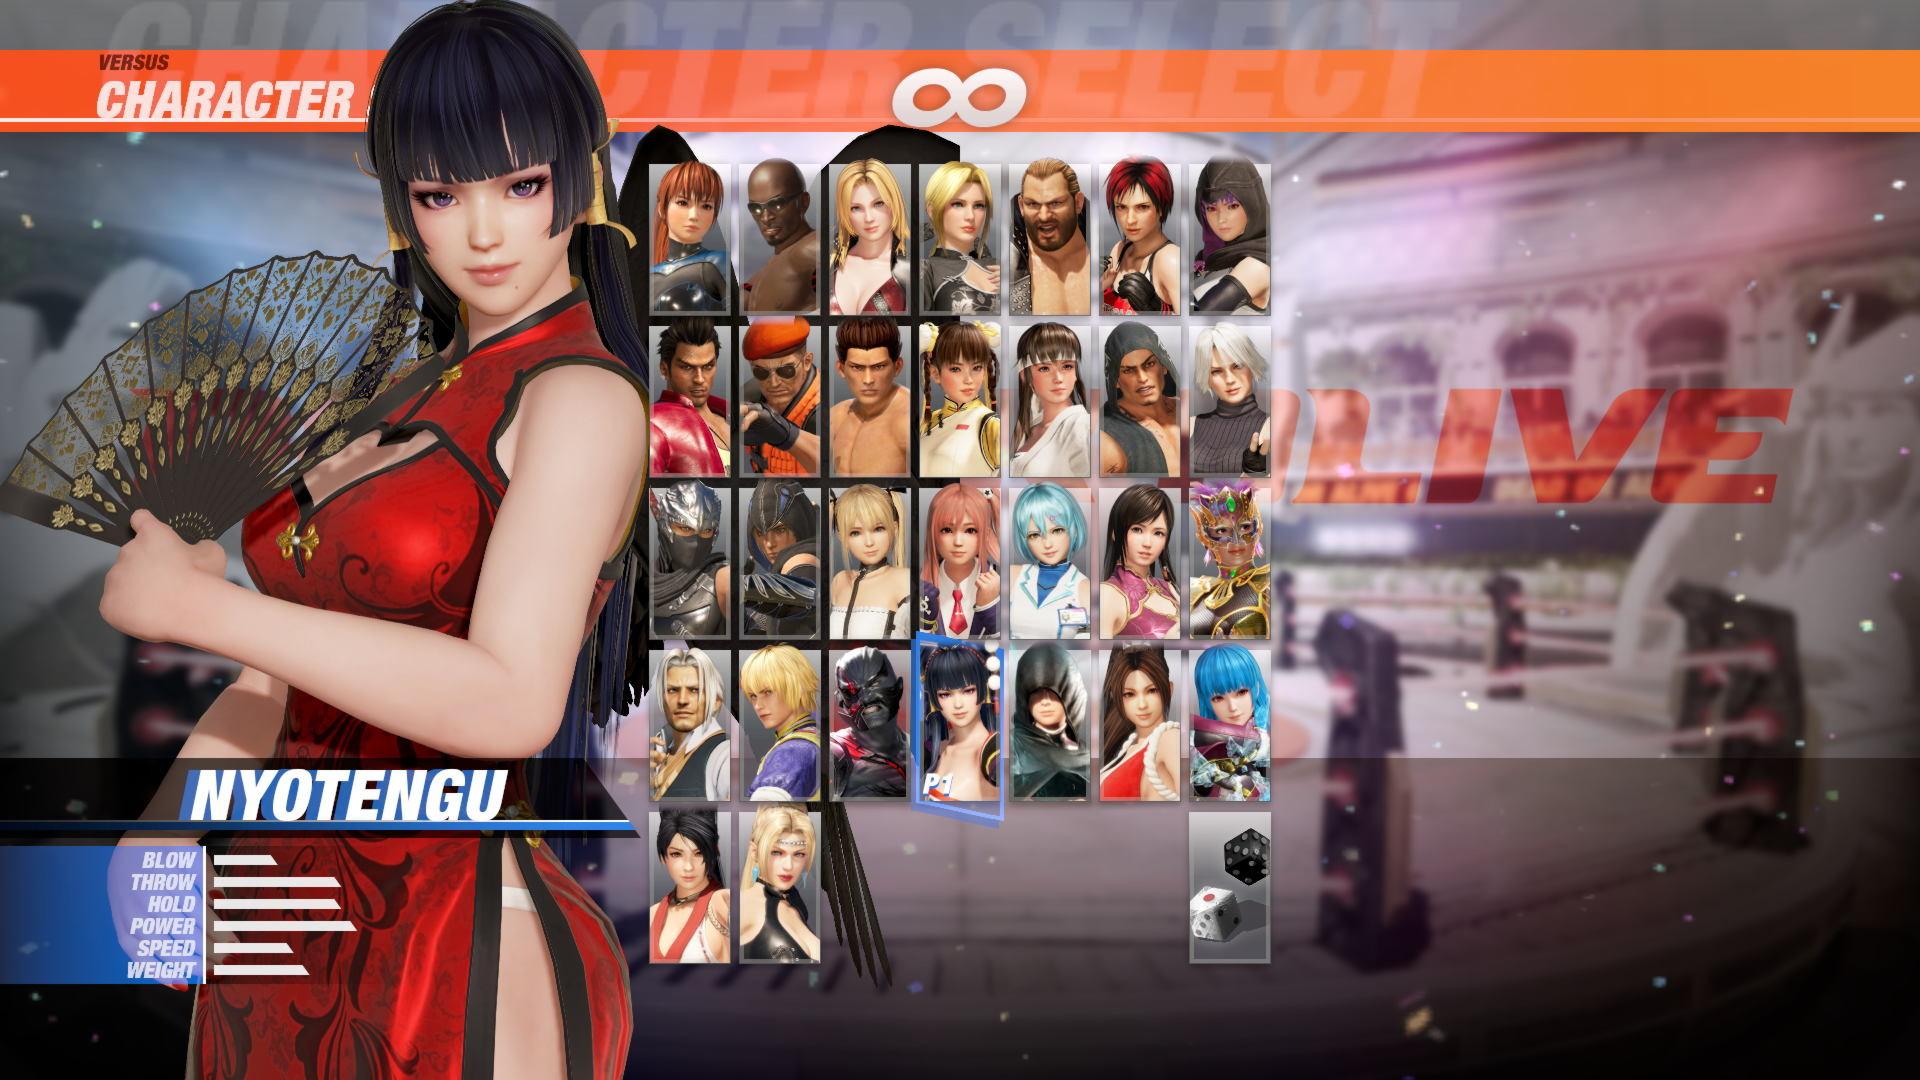 [Revival] DOA6 Alluring Mandarin Dress - Nyotengu screenshot